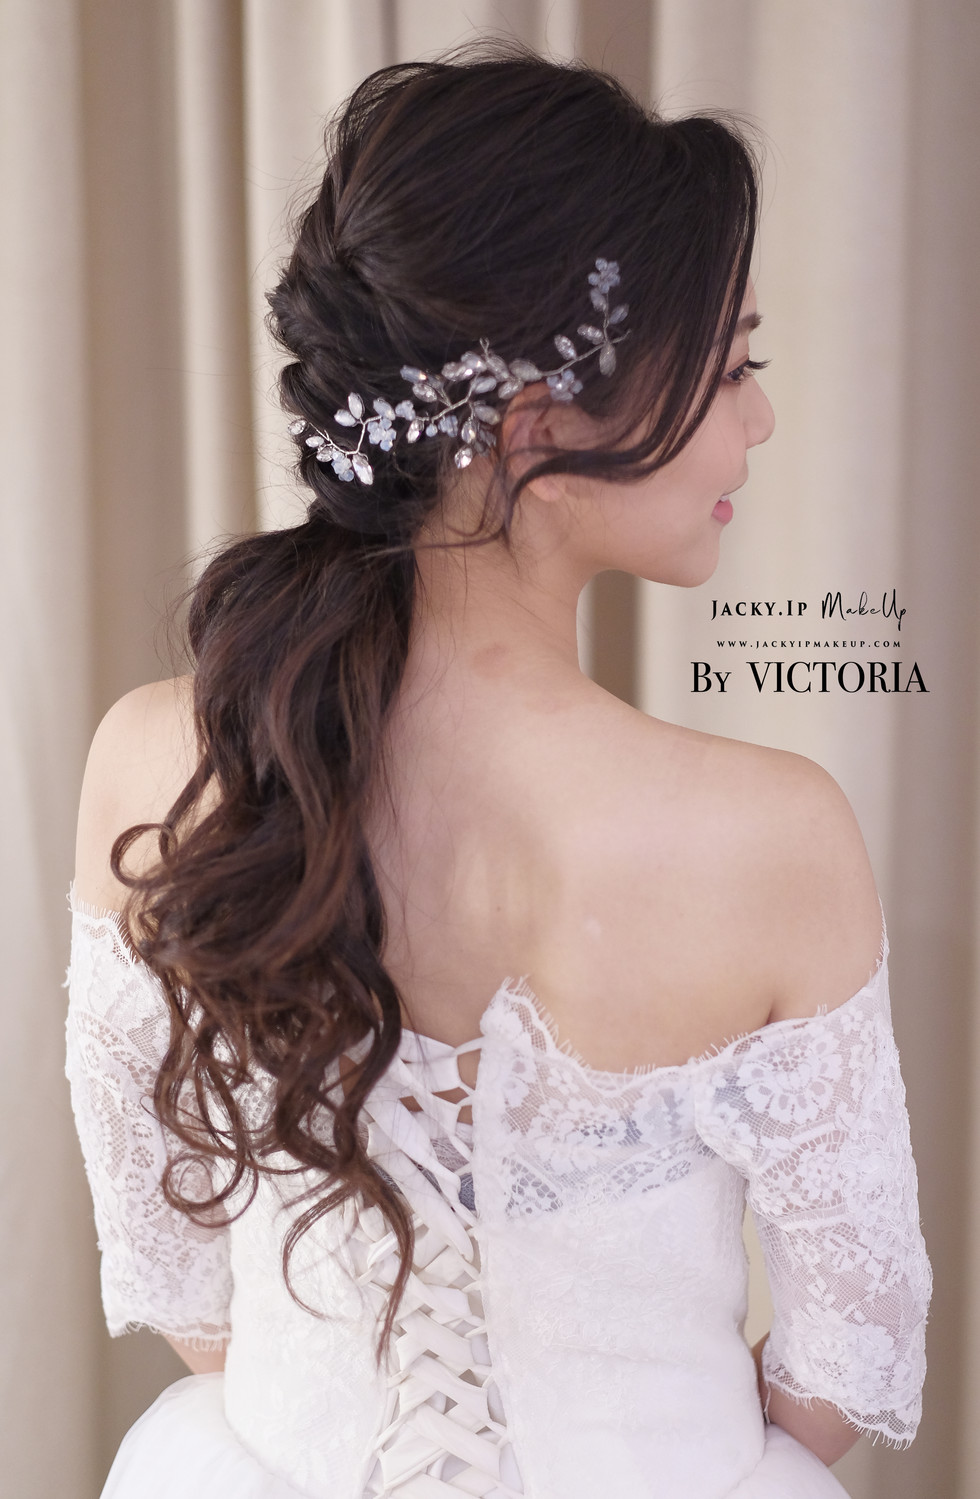 By Pro MUA Victoria